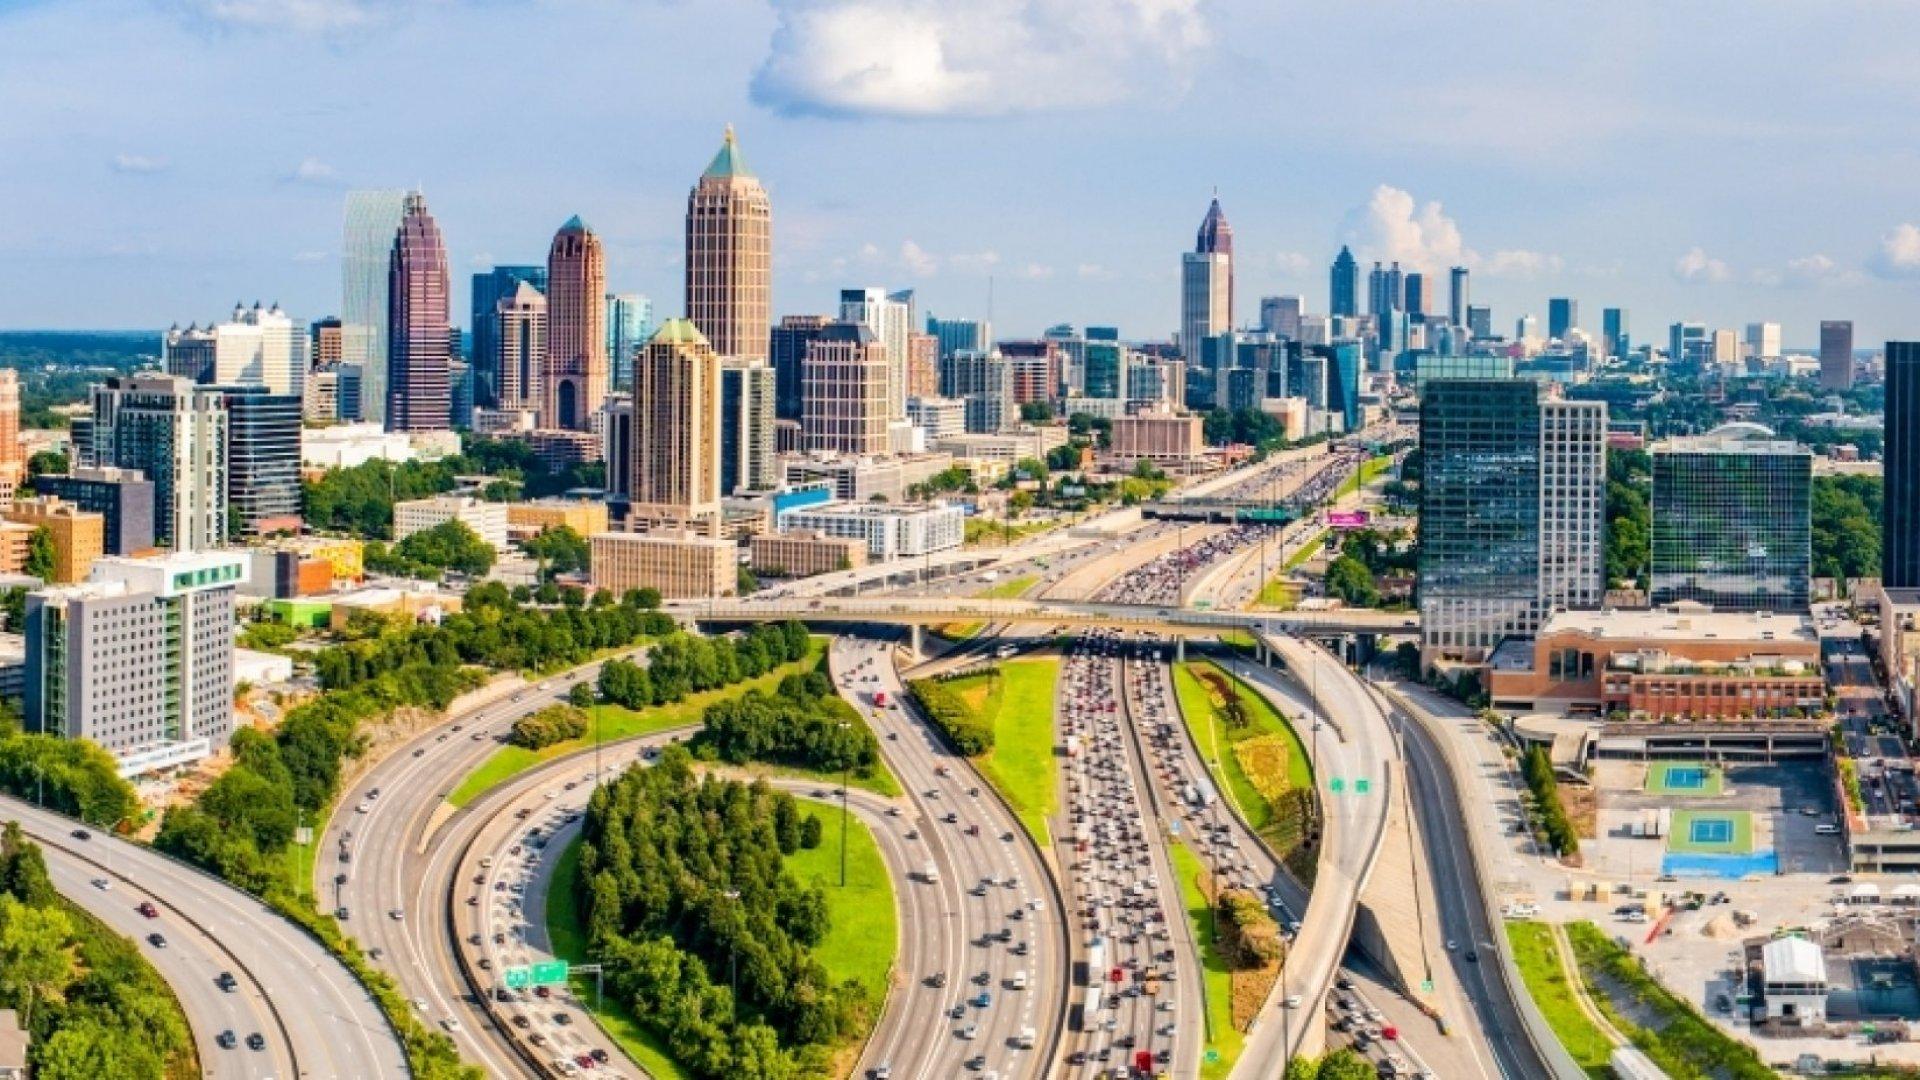 Meet the Top 10 Fast-Growing Companies Fueling Atlanta's High-Powered Startup Scene